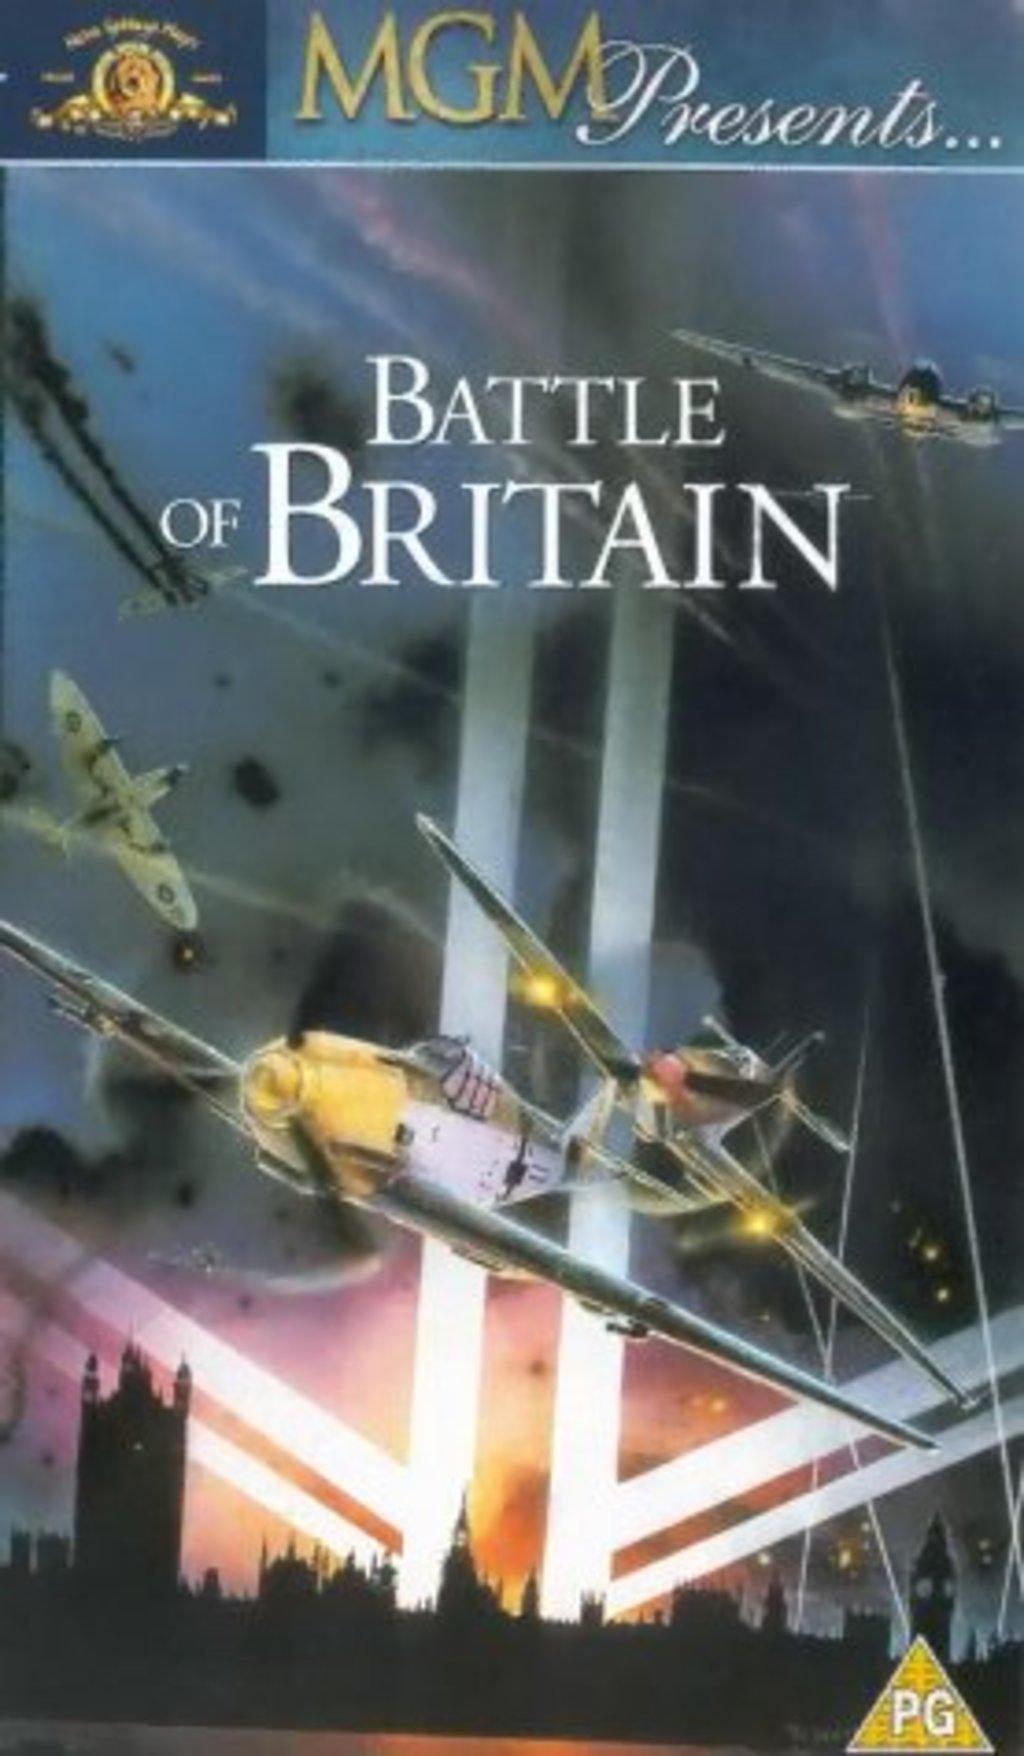 watch battle of britain on netflix today netflixmoviescom